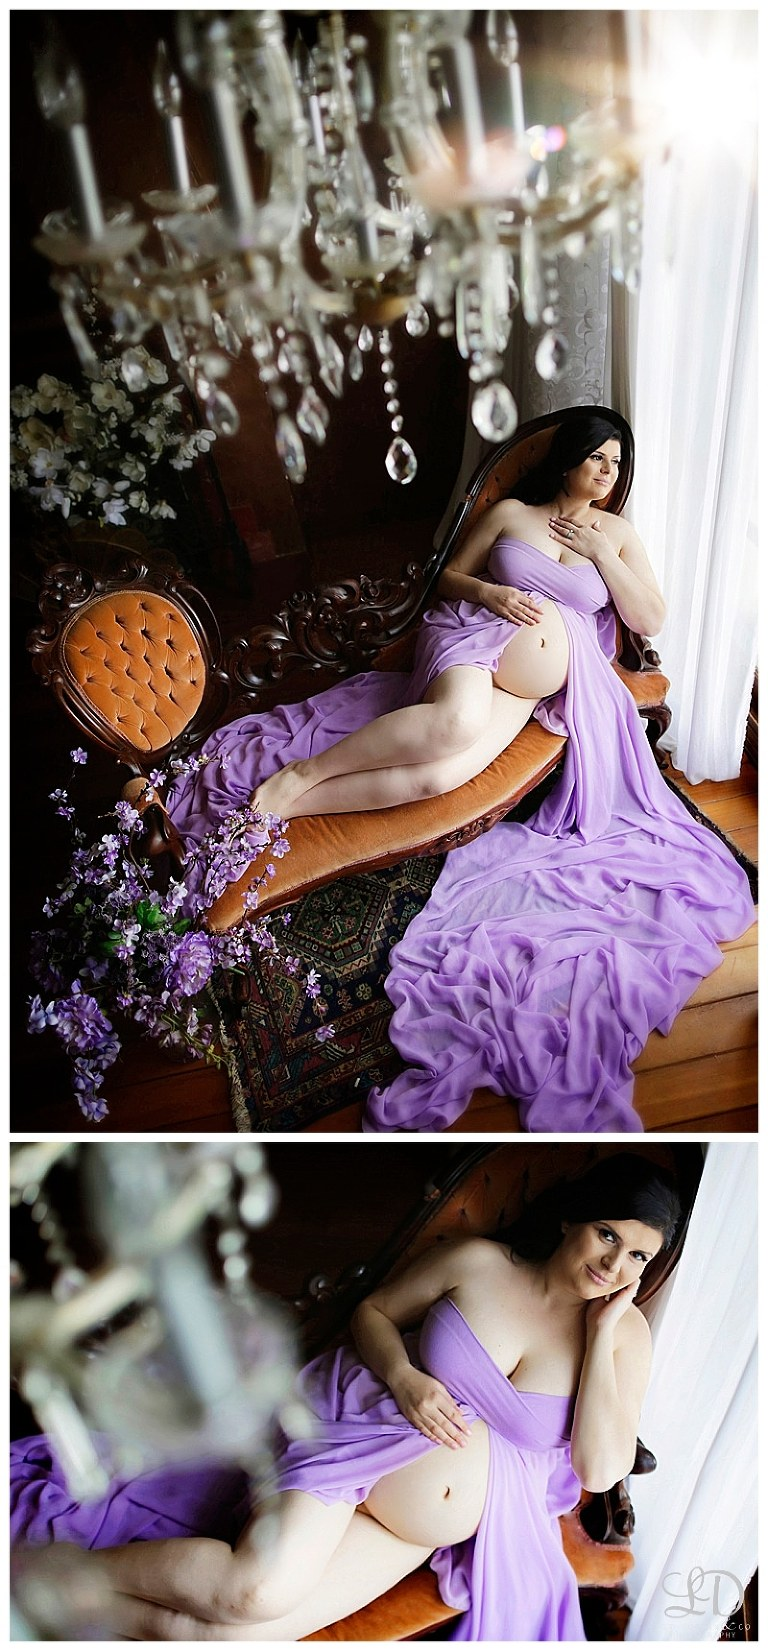 sweet maternity photoshoot-lori dorman photography-maternity boudoir-professional photographer_4841.jpg